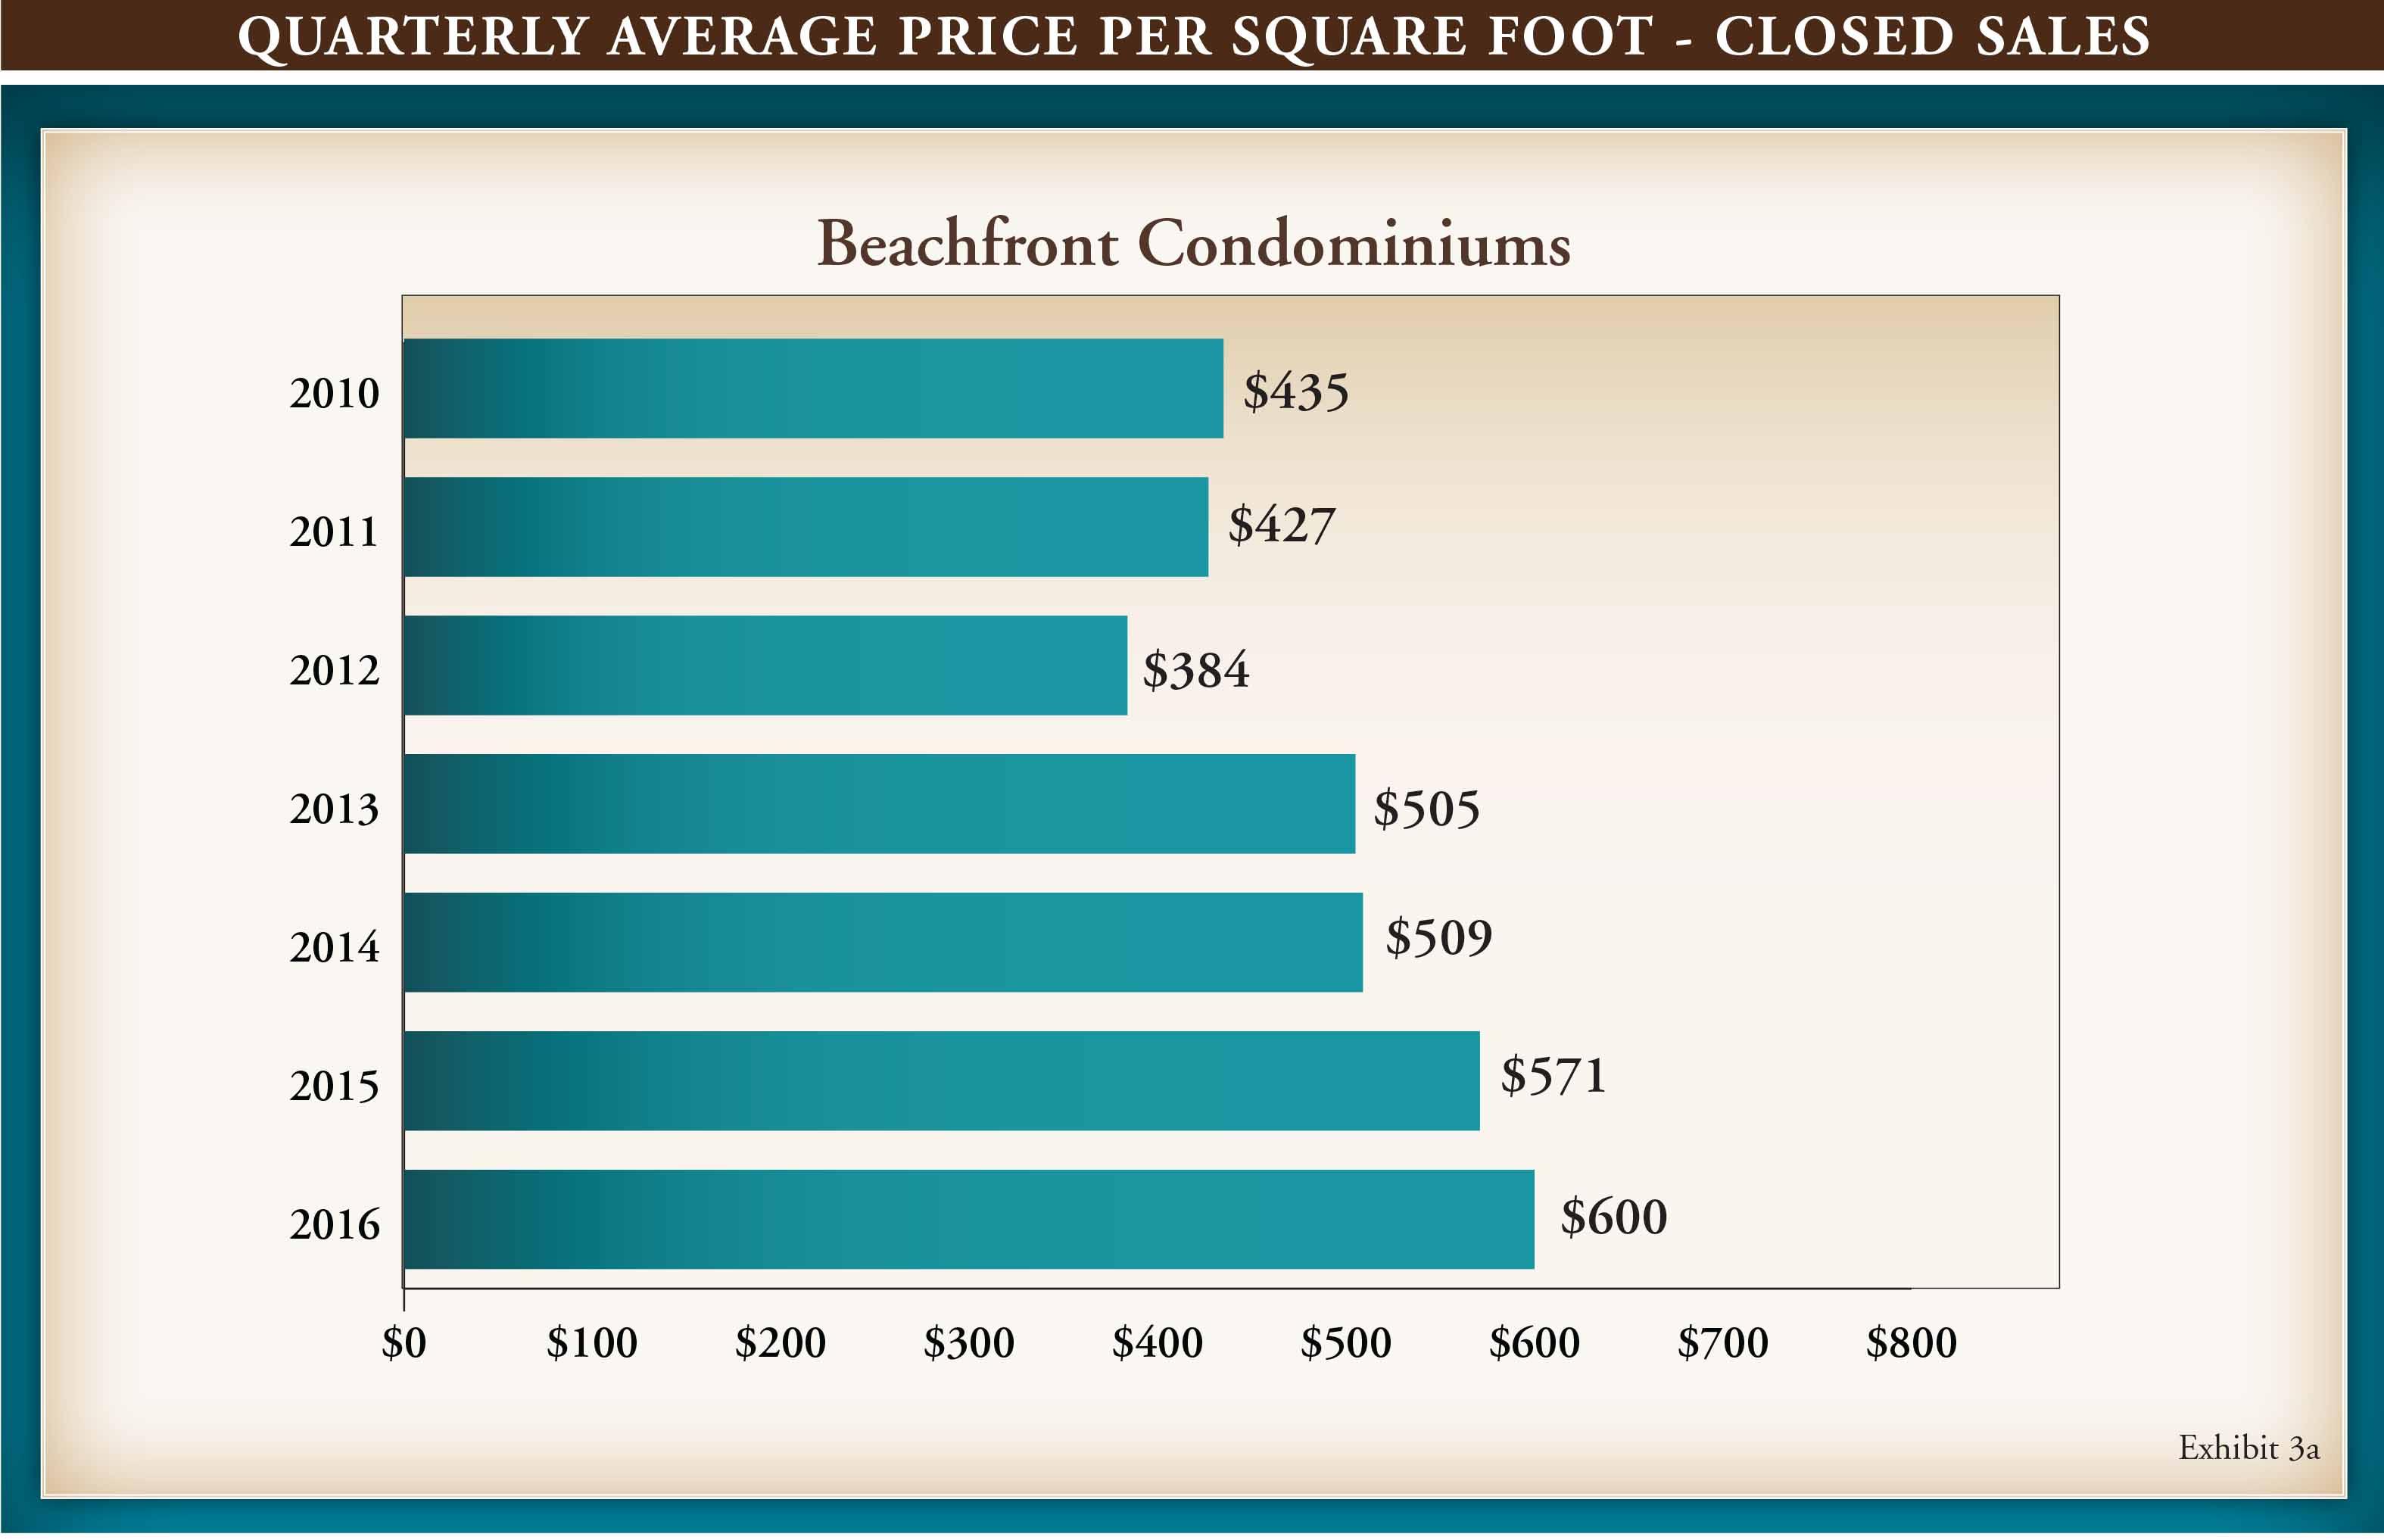 Gulf Shore Blvd Q3 Market Report 2016.indd